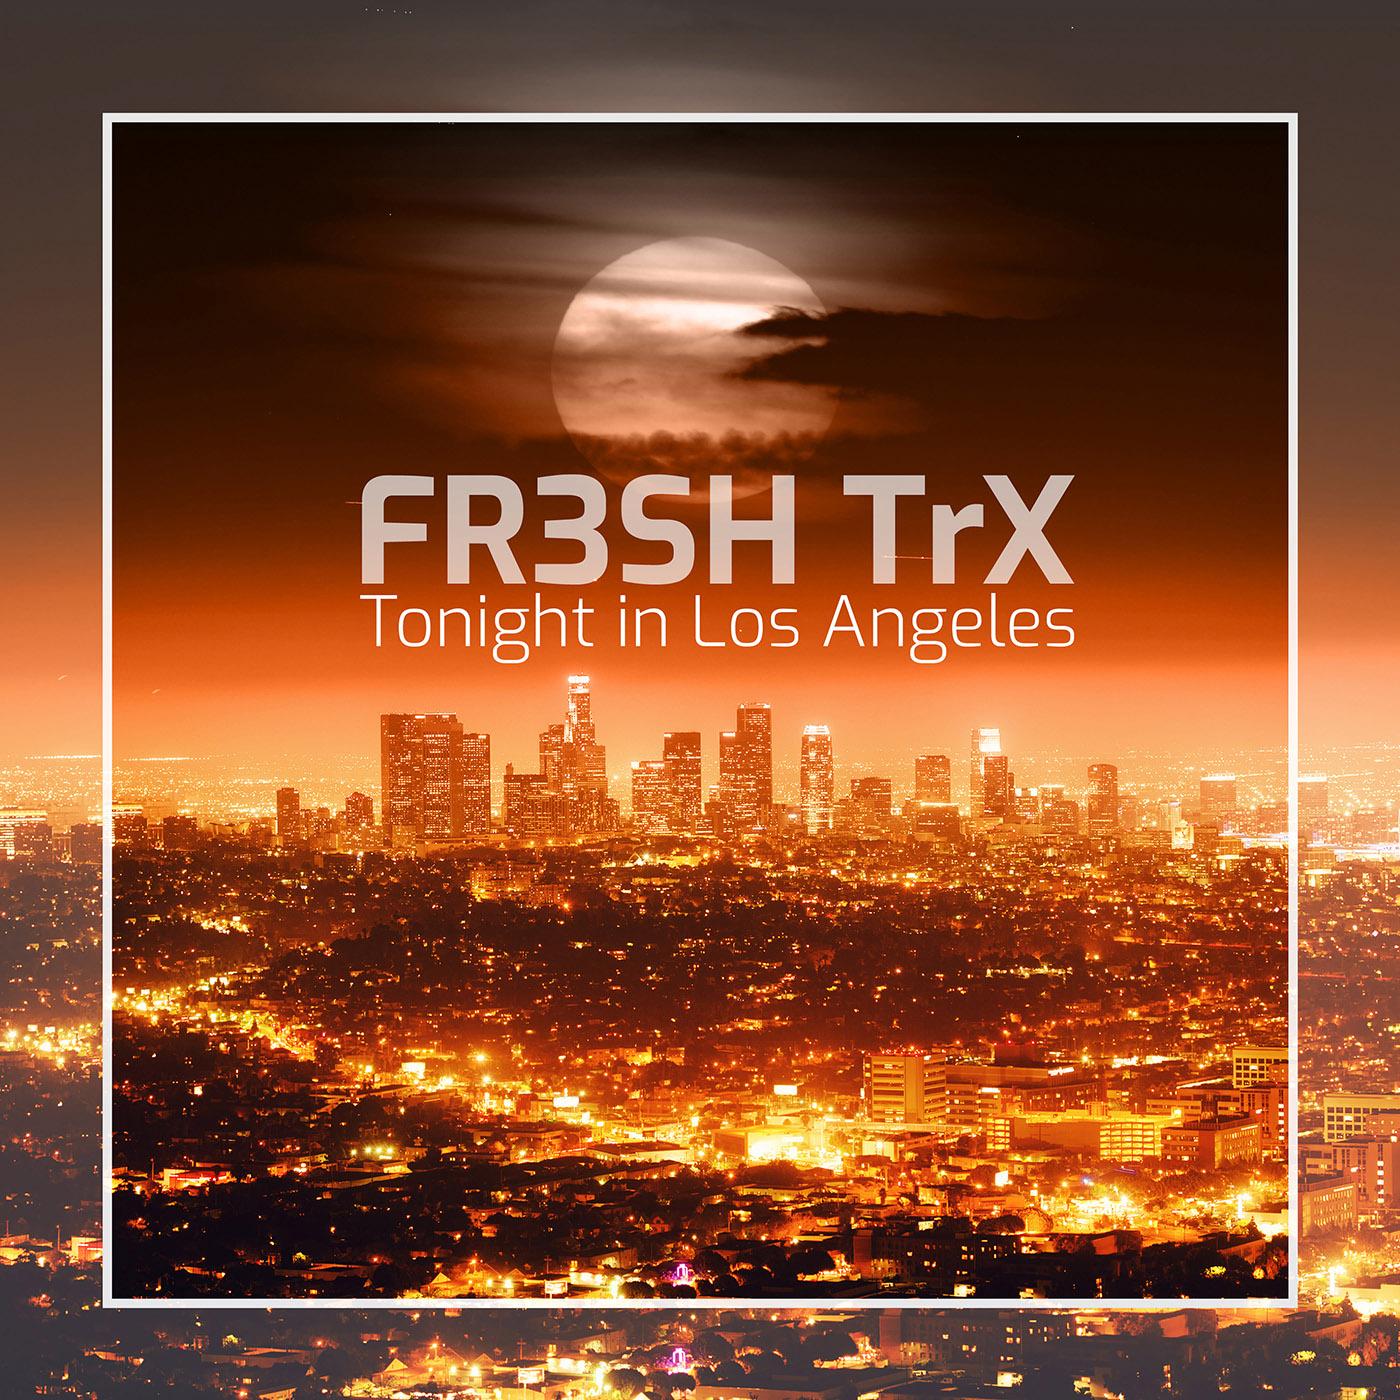 "FR3SH TrX ""Tonight in Los Angeles"" – let's get fr3sh!"